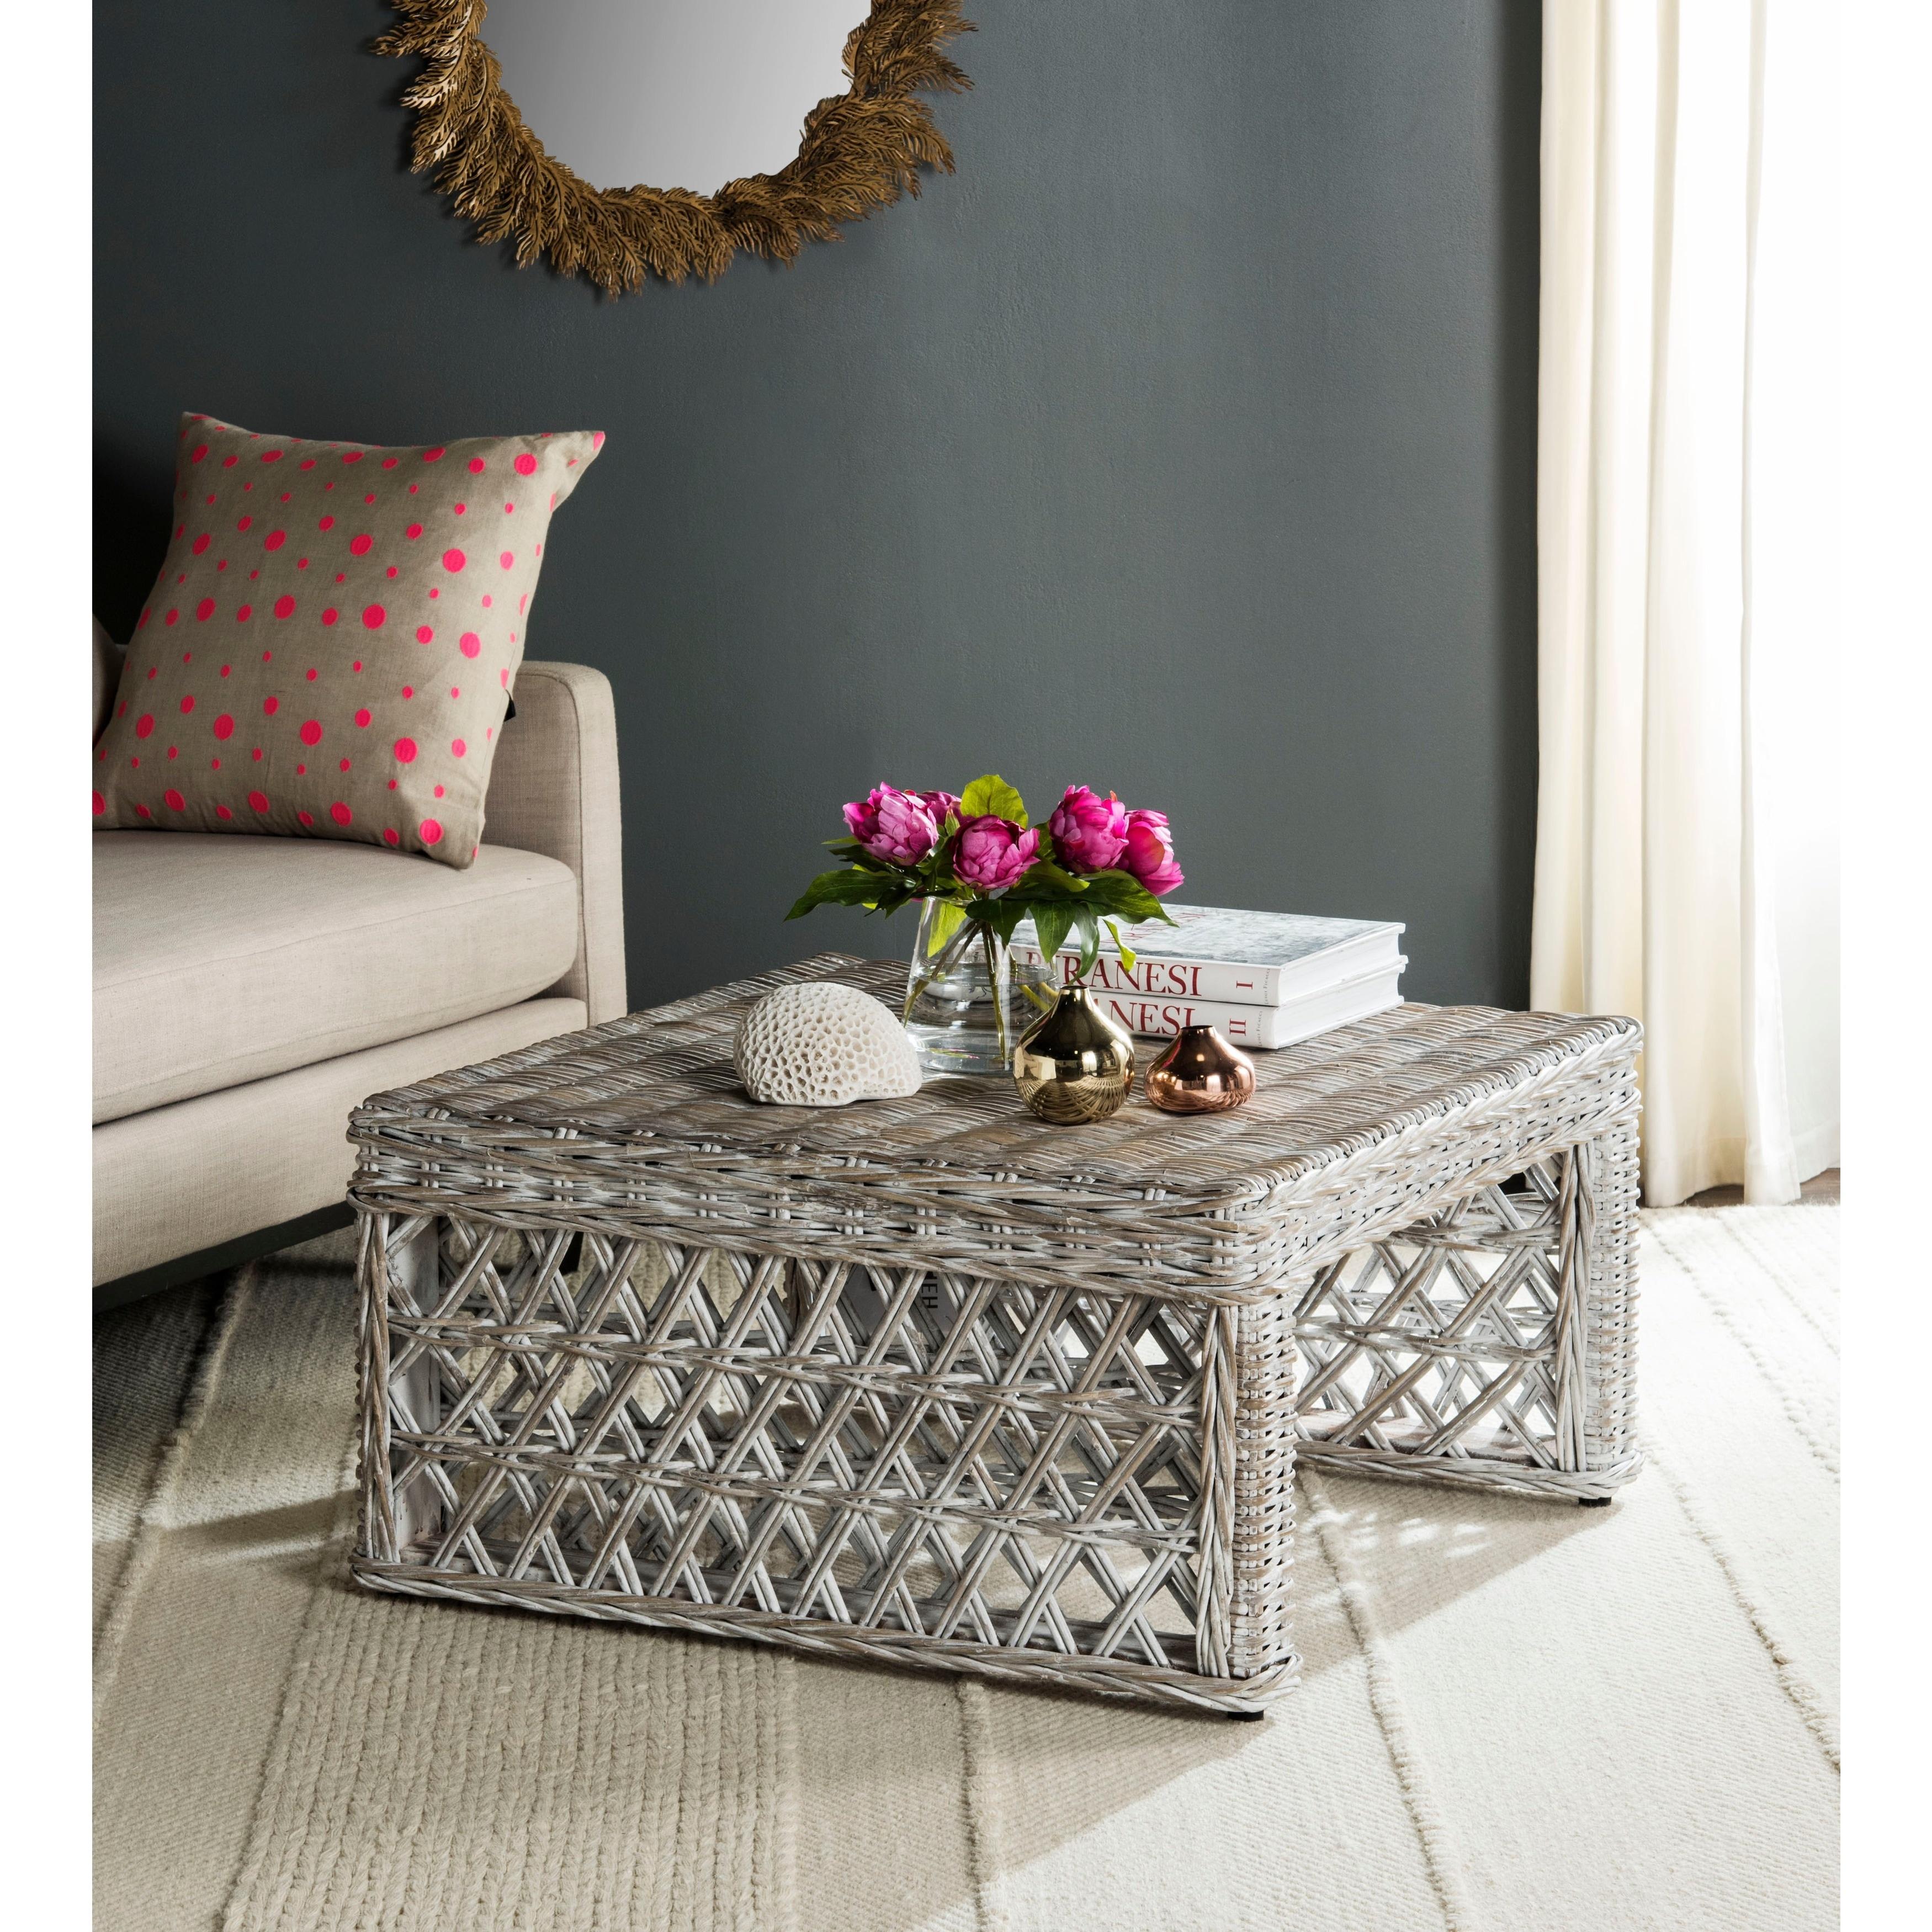 Magnificent Safavieh Shila White Washed Rattan Table 31 5 X 31 5 X 17 6 Ibusinesslaw Wood Chair Design Ideas Ibusinesslaworg